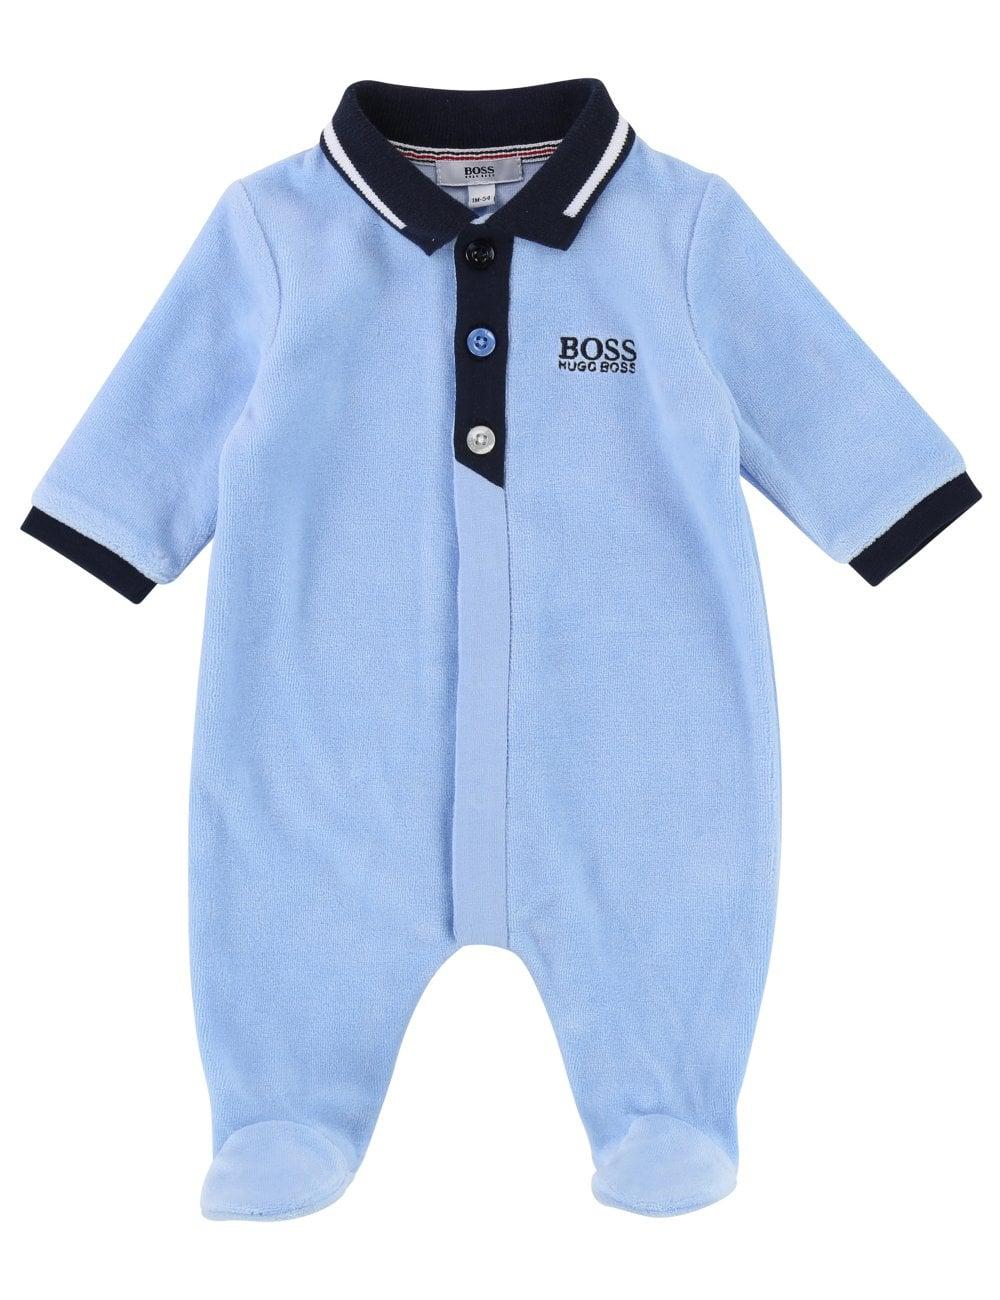 Baby boys Hugo boss outfit age newborn